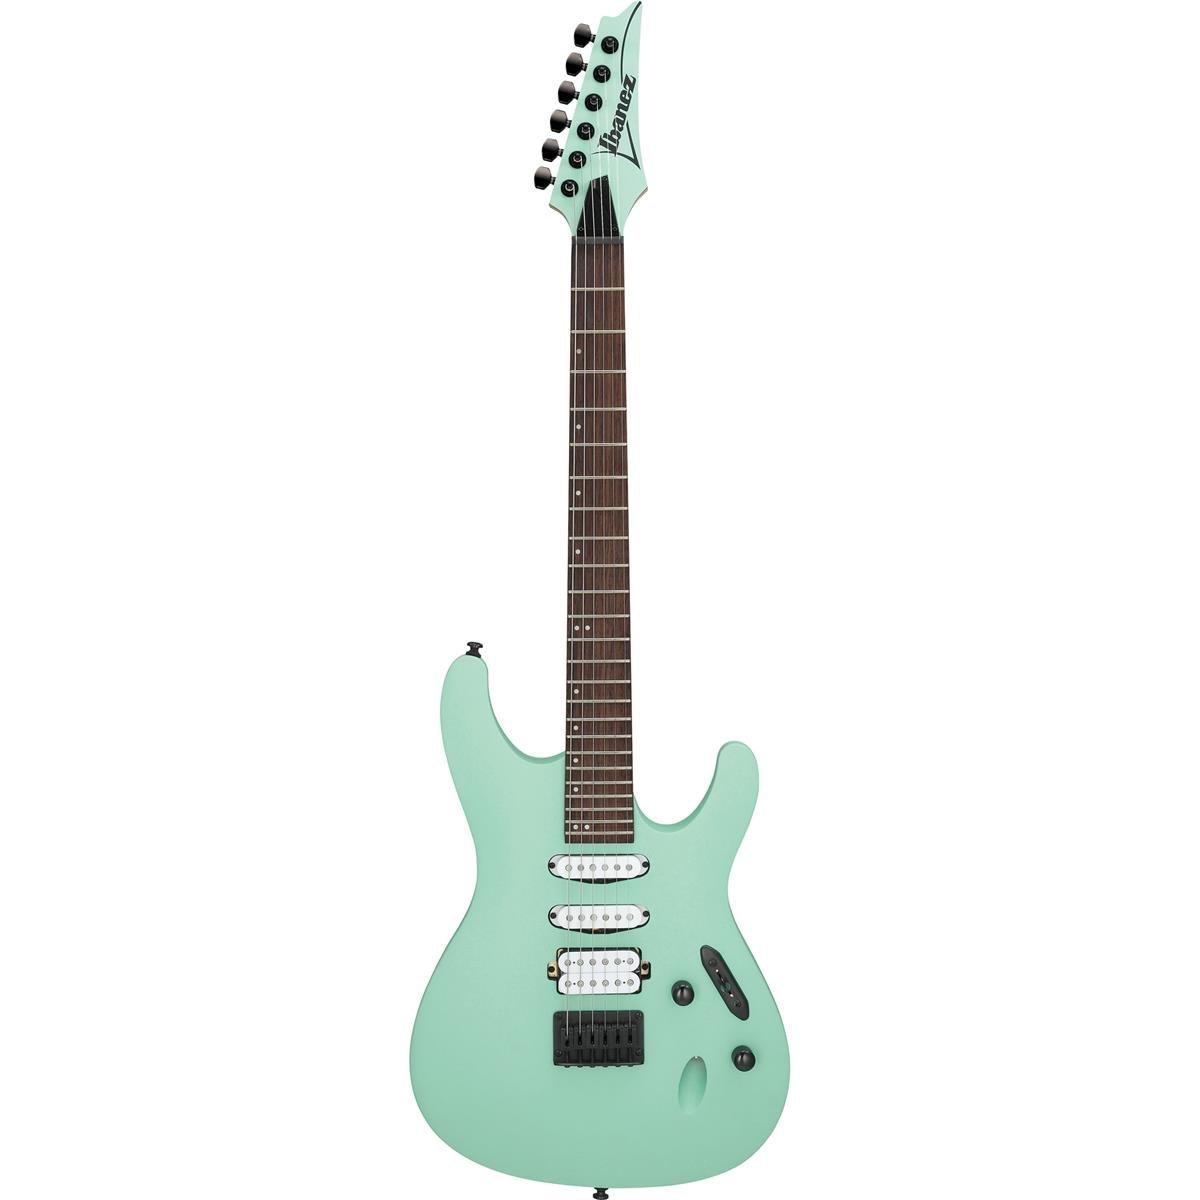 (Pre-Order) Ibanez S561SFM S Series Electric Guitar - Seafoam Green